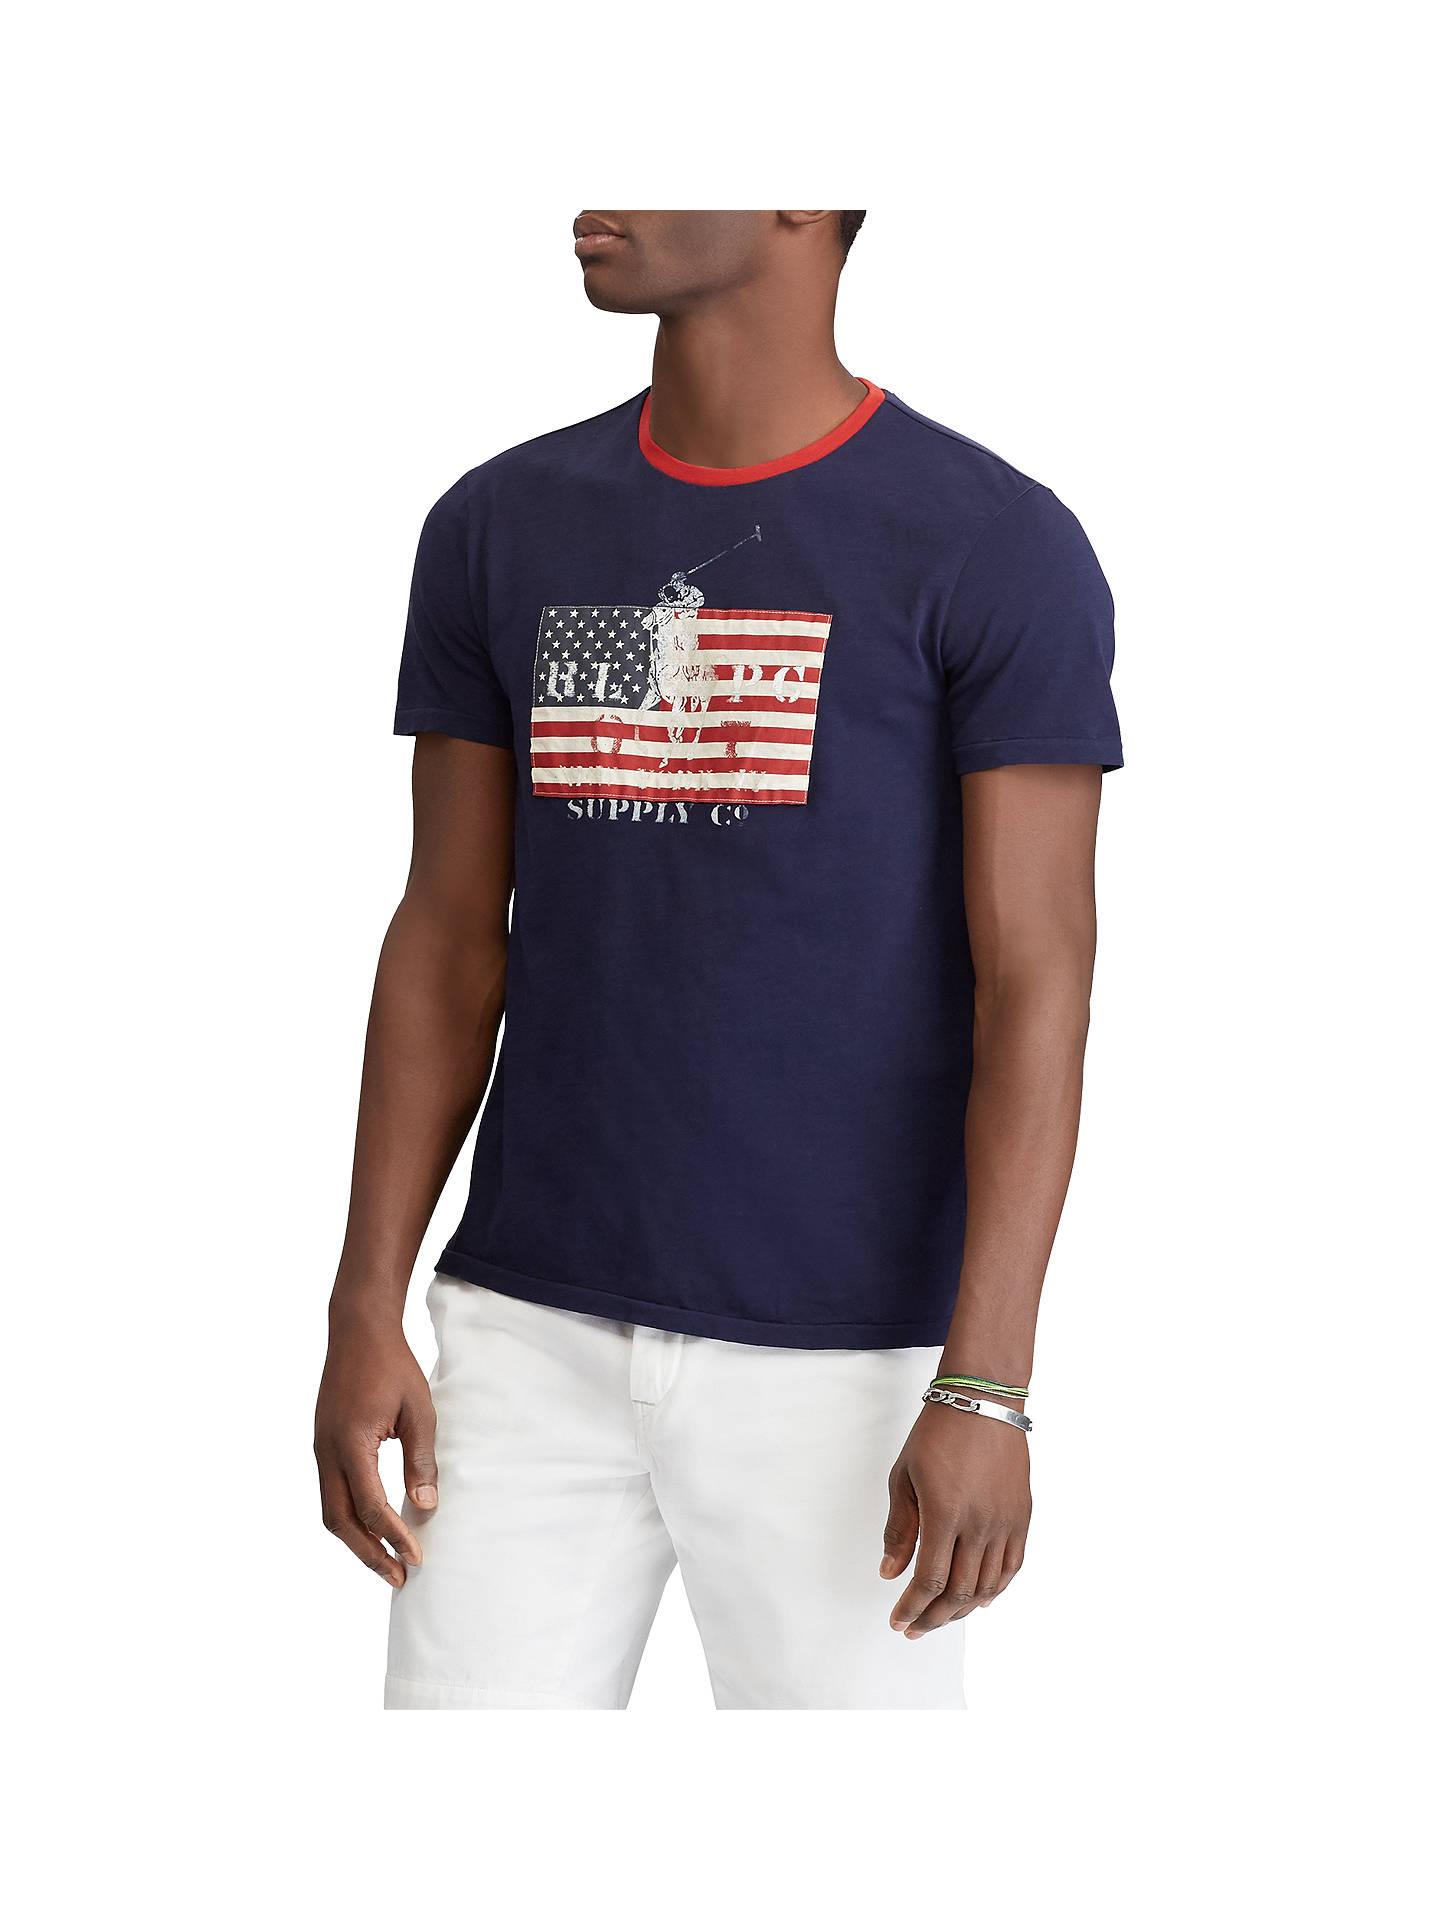 ee22a387cad5 Buy Polo Ralph Lauren Short Sleeve American Flag T-Shirt